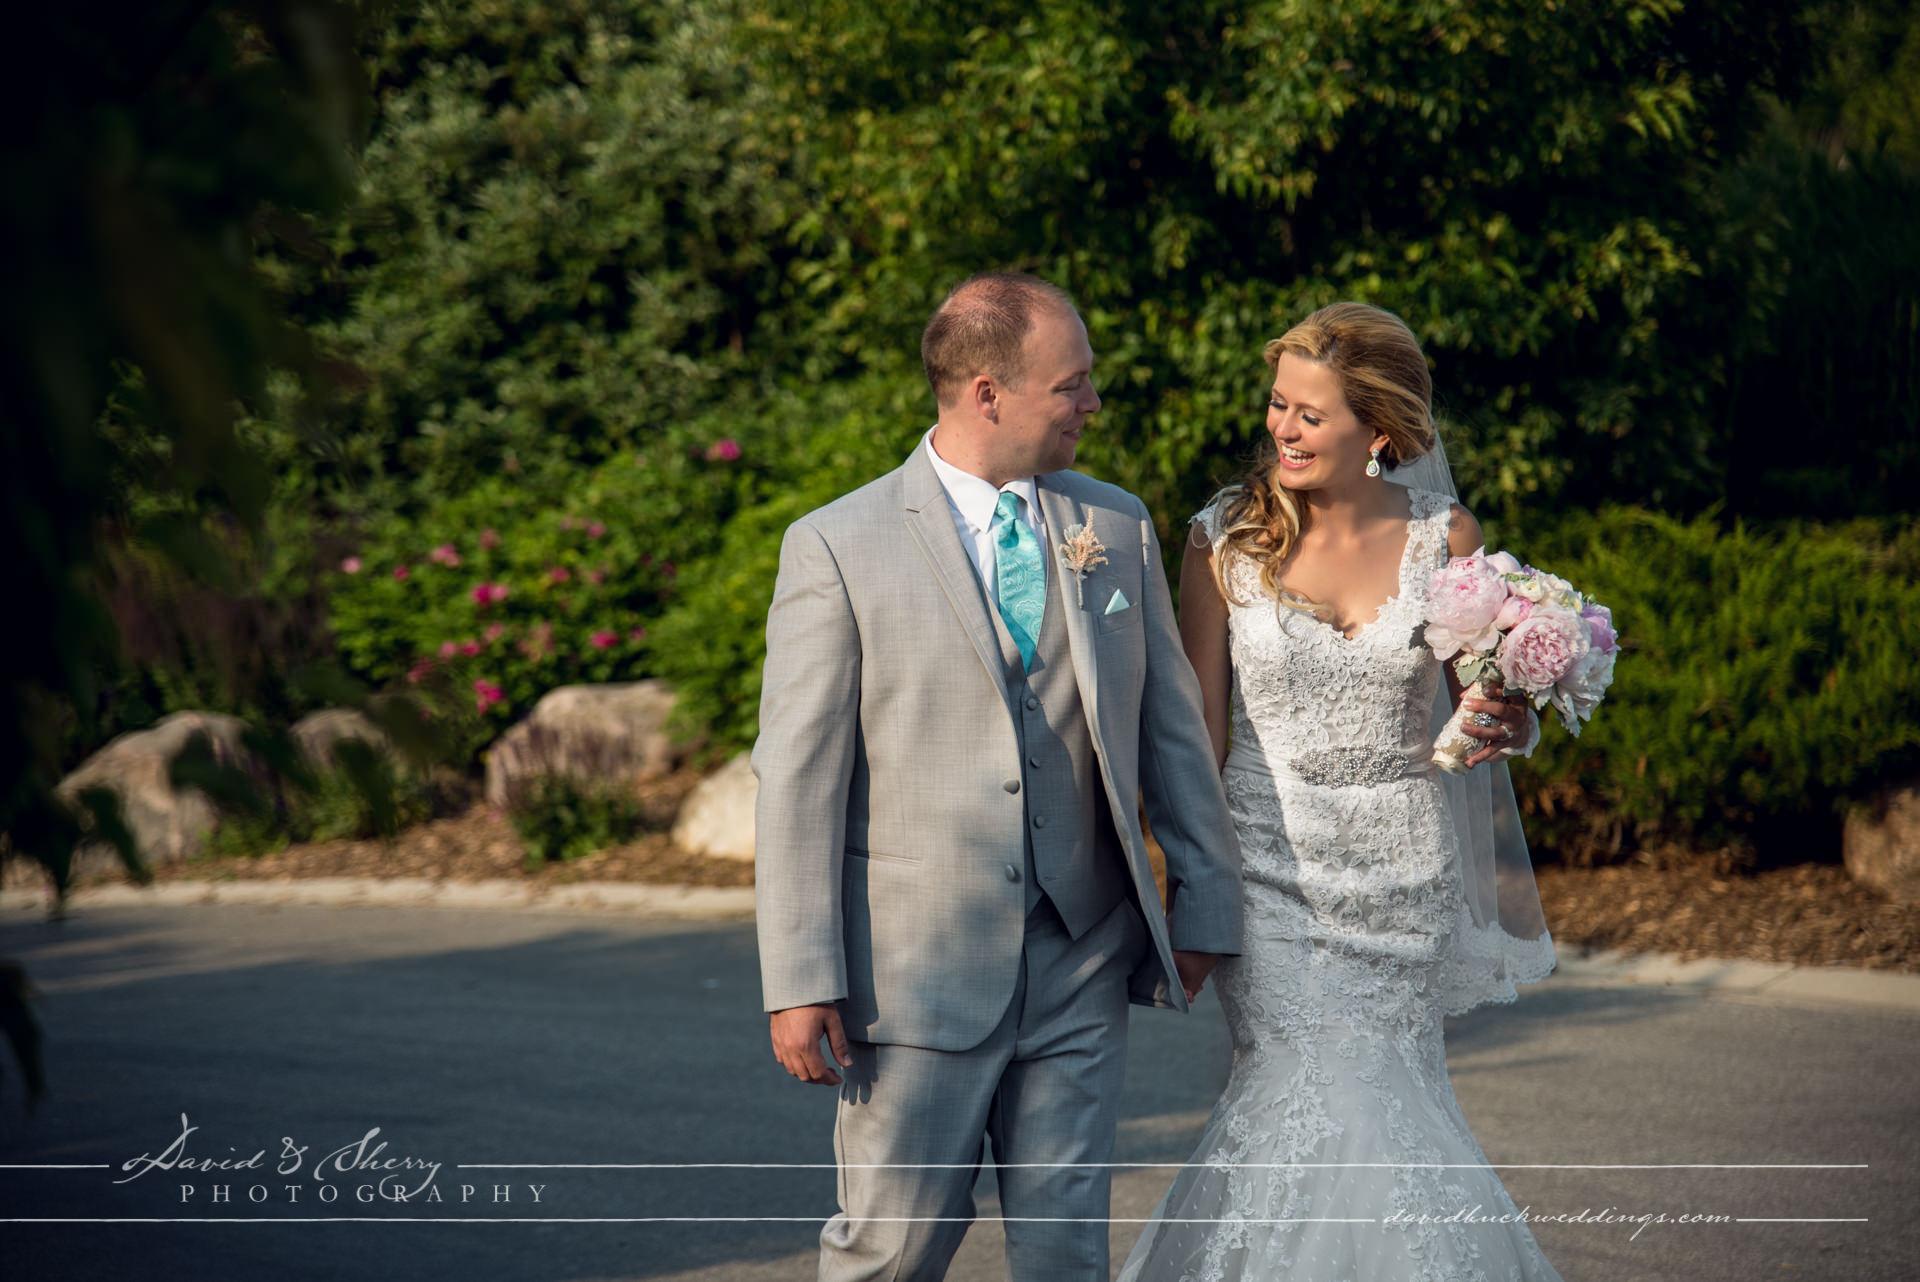 Cobble_Beach_Wedding_Photography_Owen_Sound_31